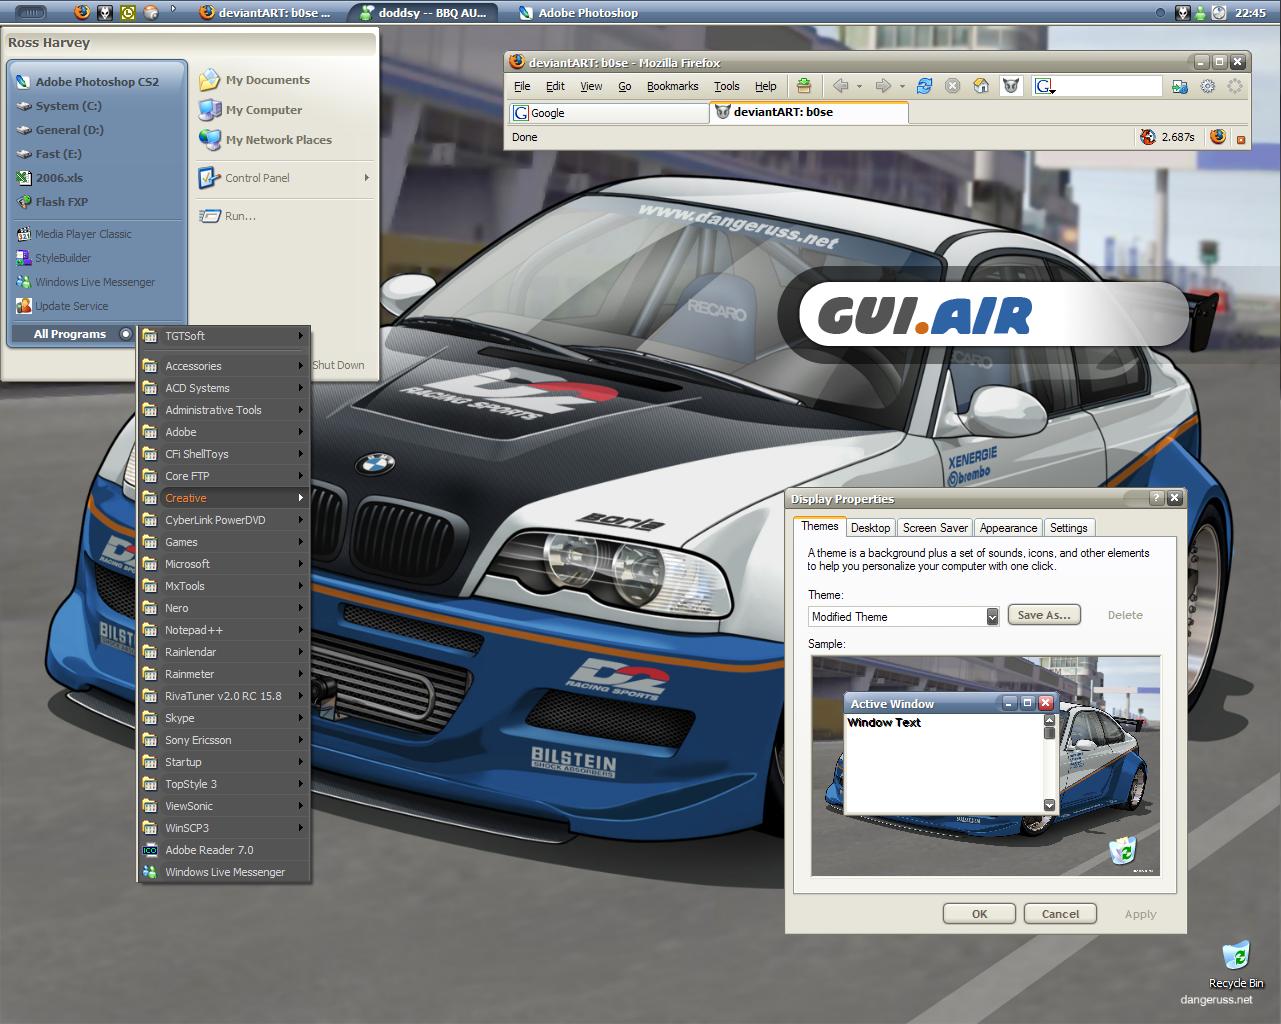 VS Preview: Gui.Air